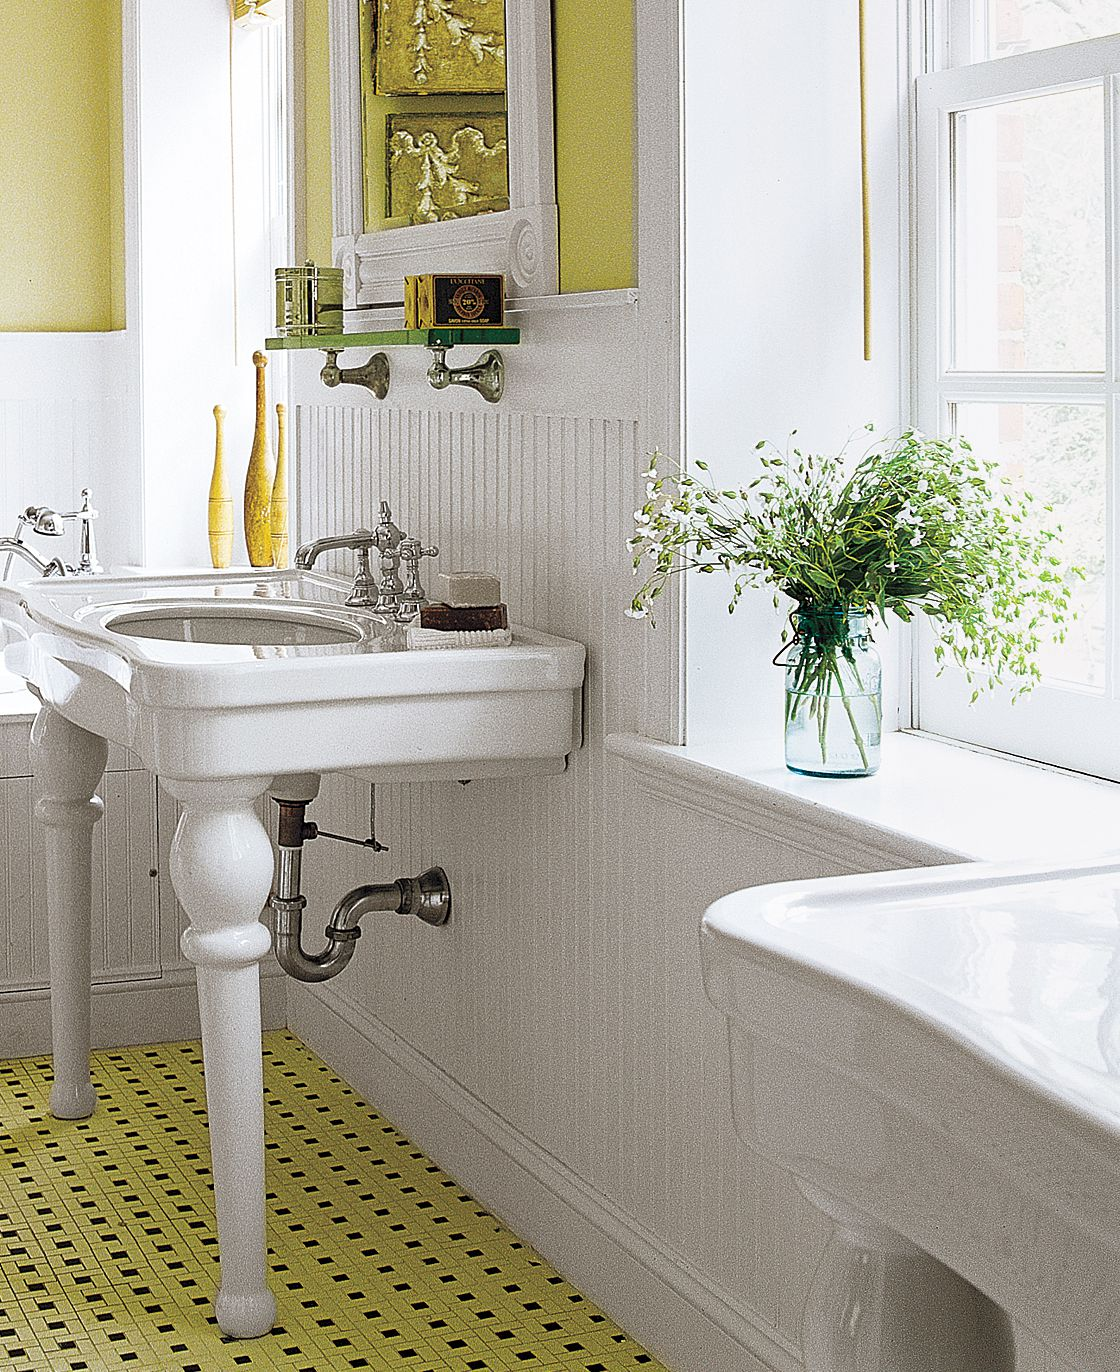 White wainscoting on bathroom walls.